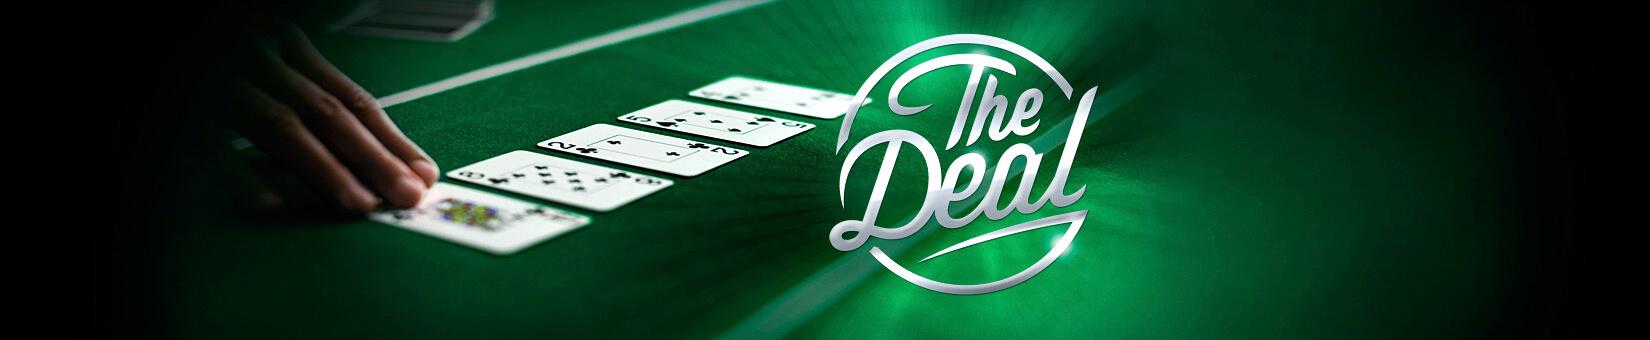 Games cash splash casino en vivo pokerstars-290639